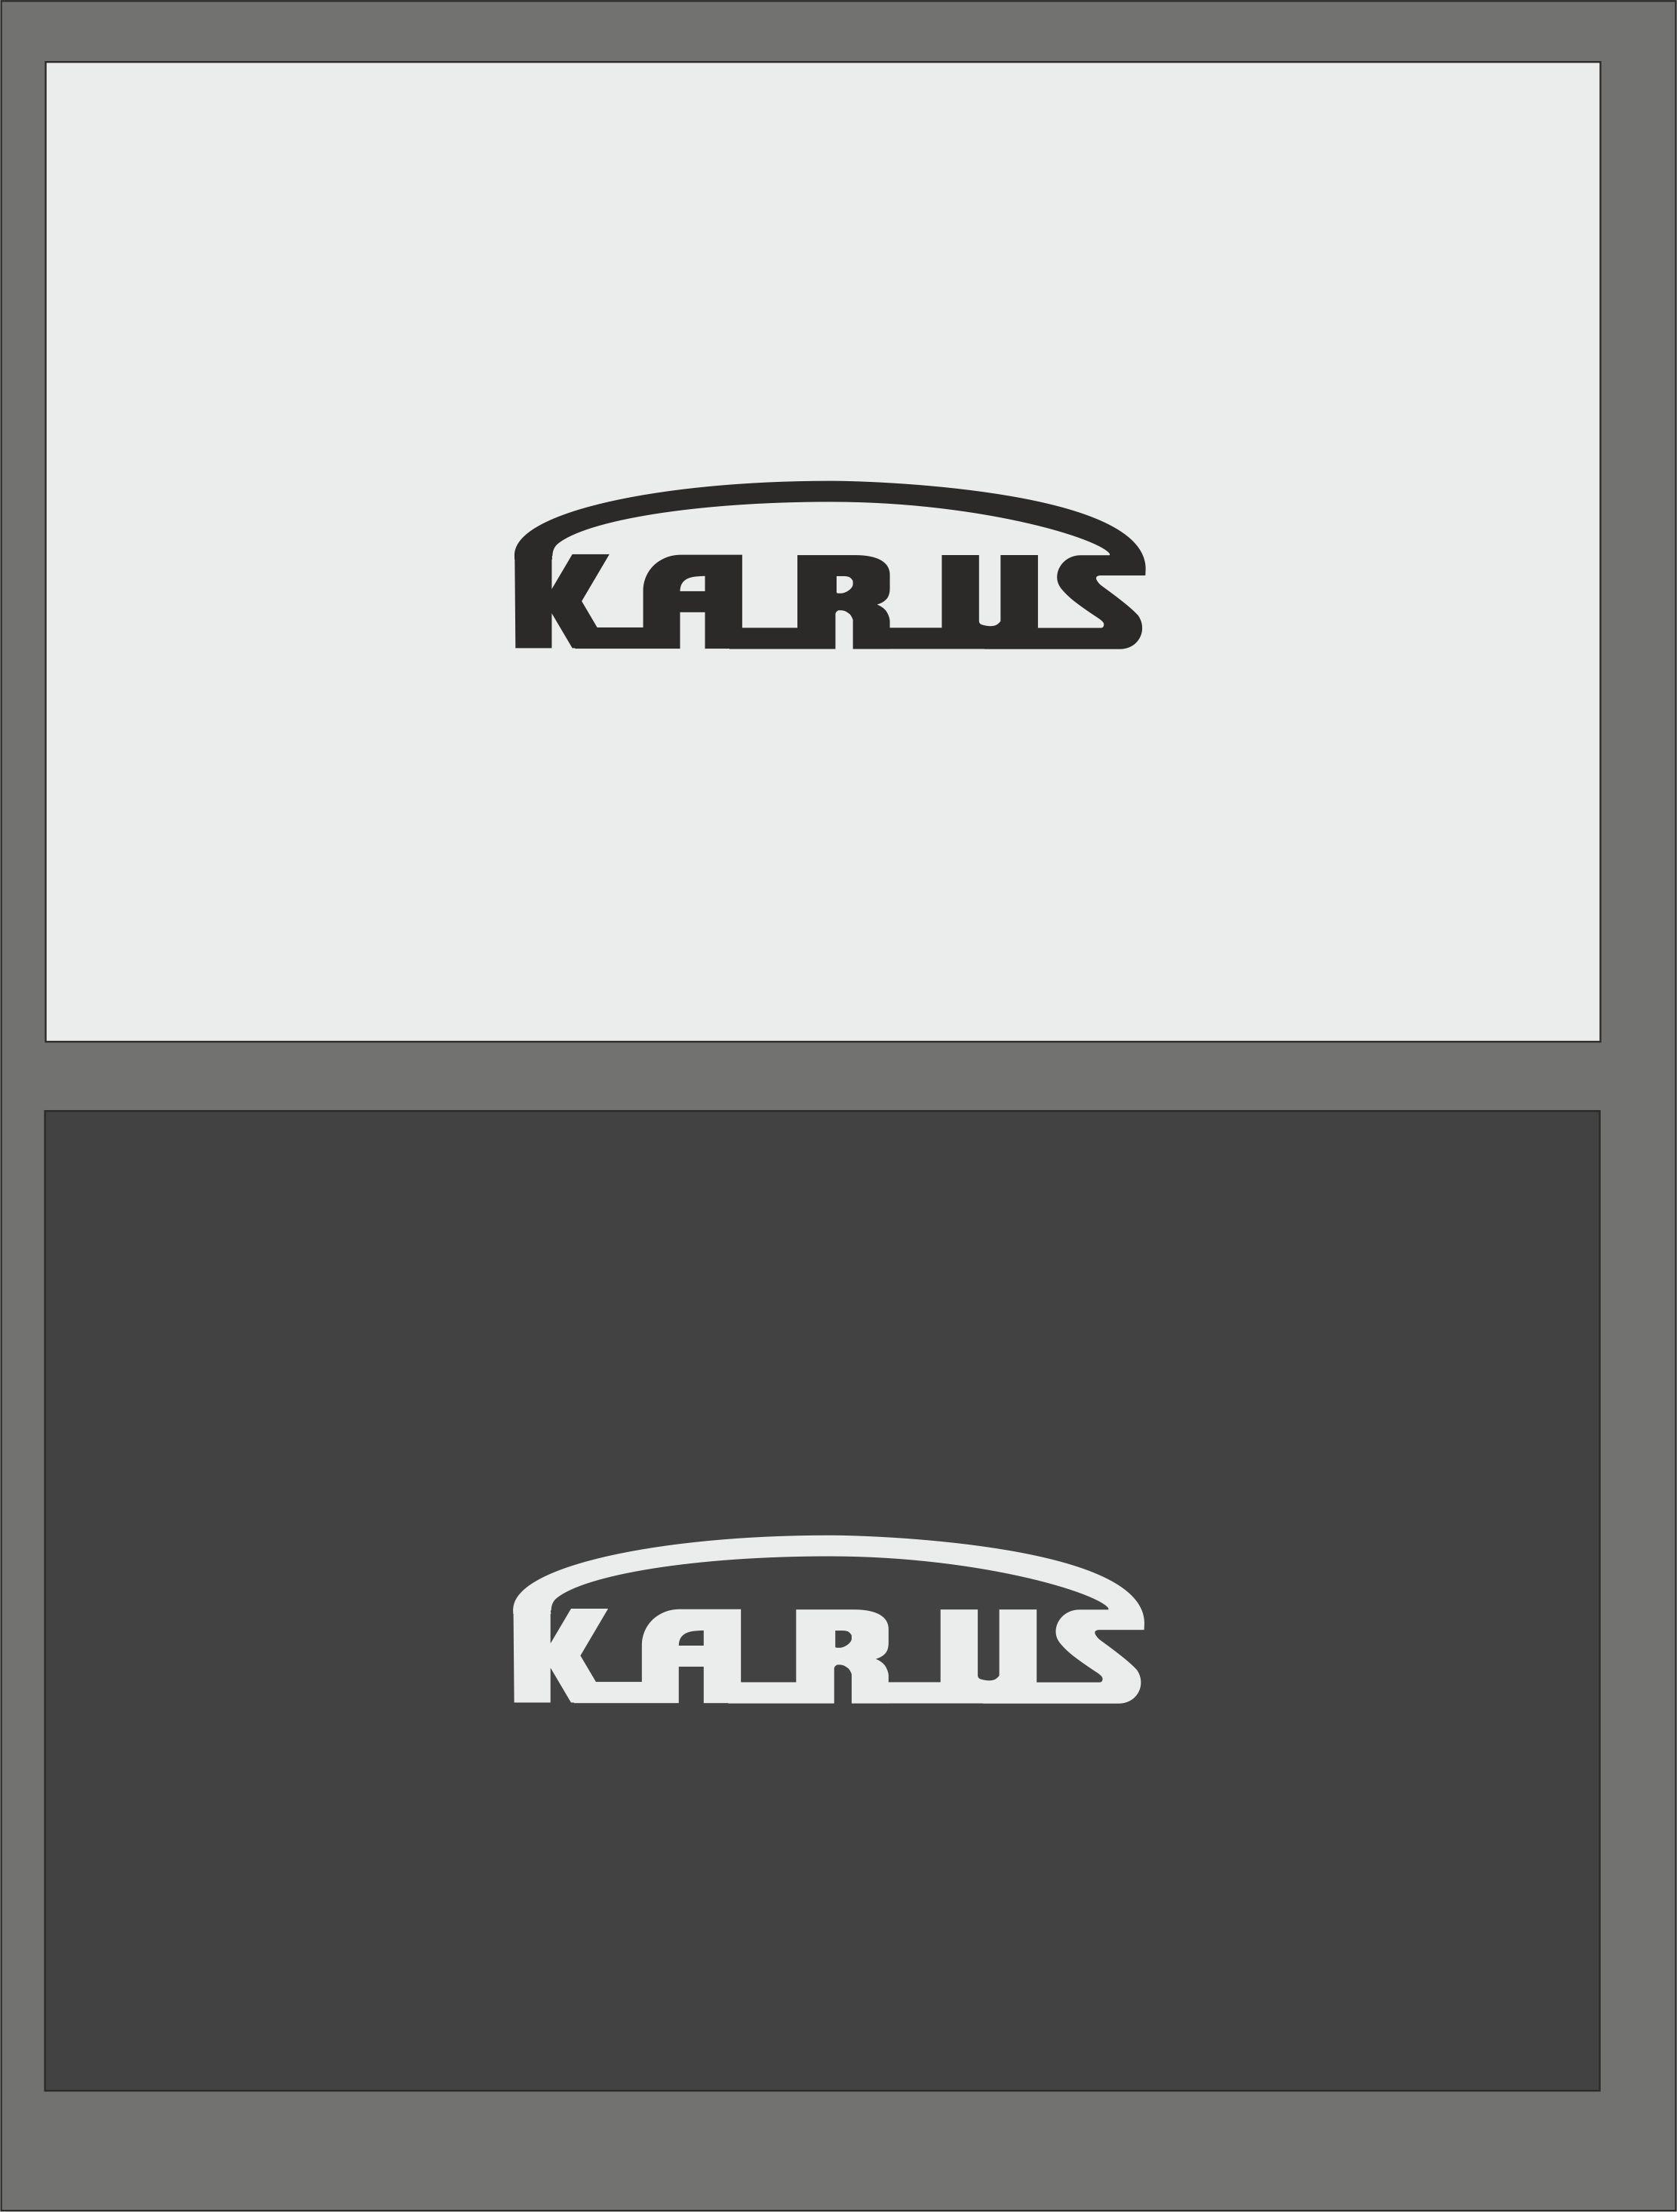 Разработка логотипа, фирменных цветов и фирменного знака фото f_574535147337ec12.jpg